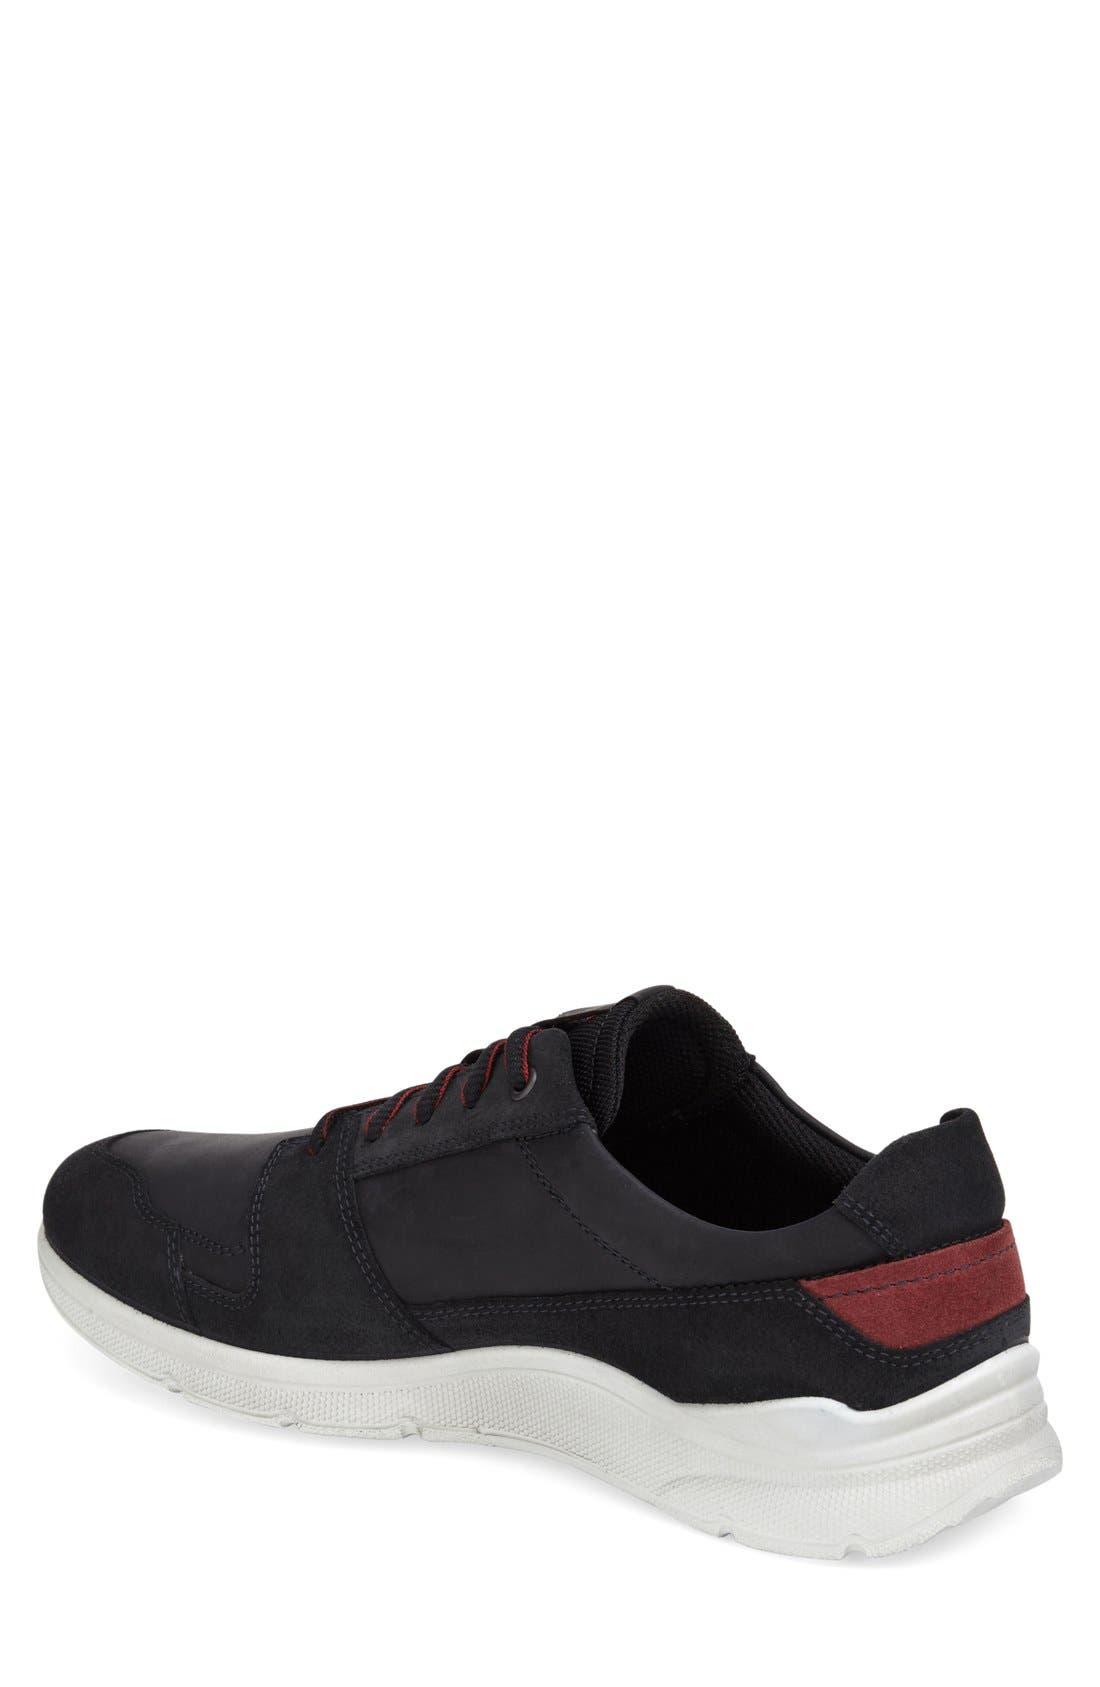 'Irondale - Retro' Sneaker,                             Alternate thumbnail 2, color,                             001